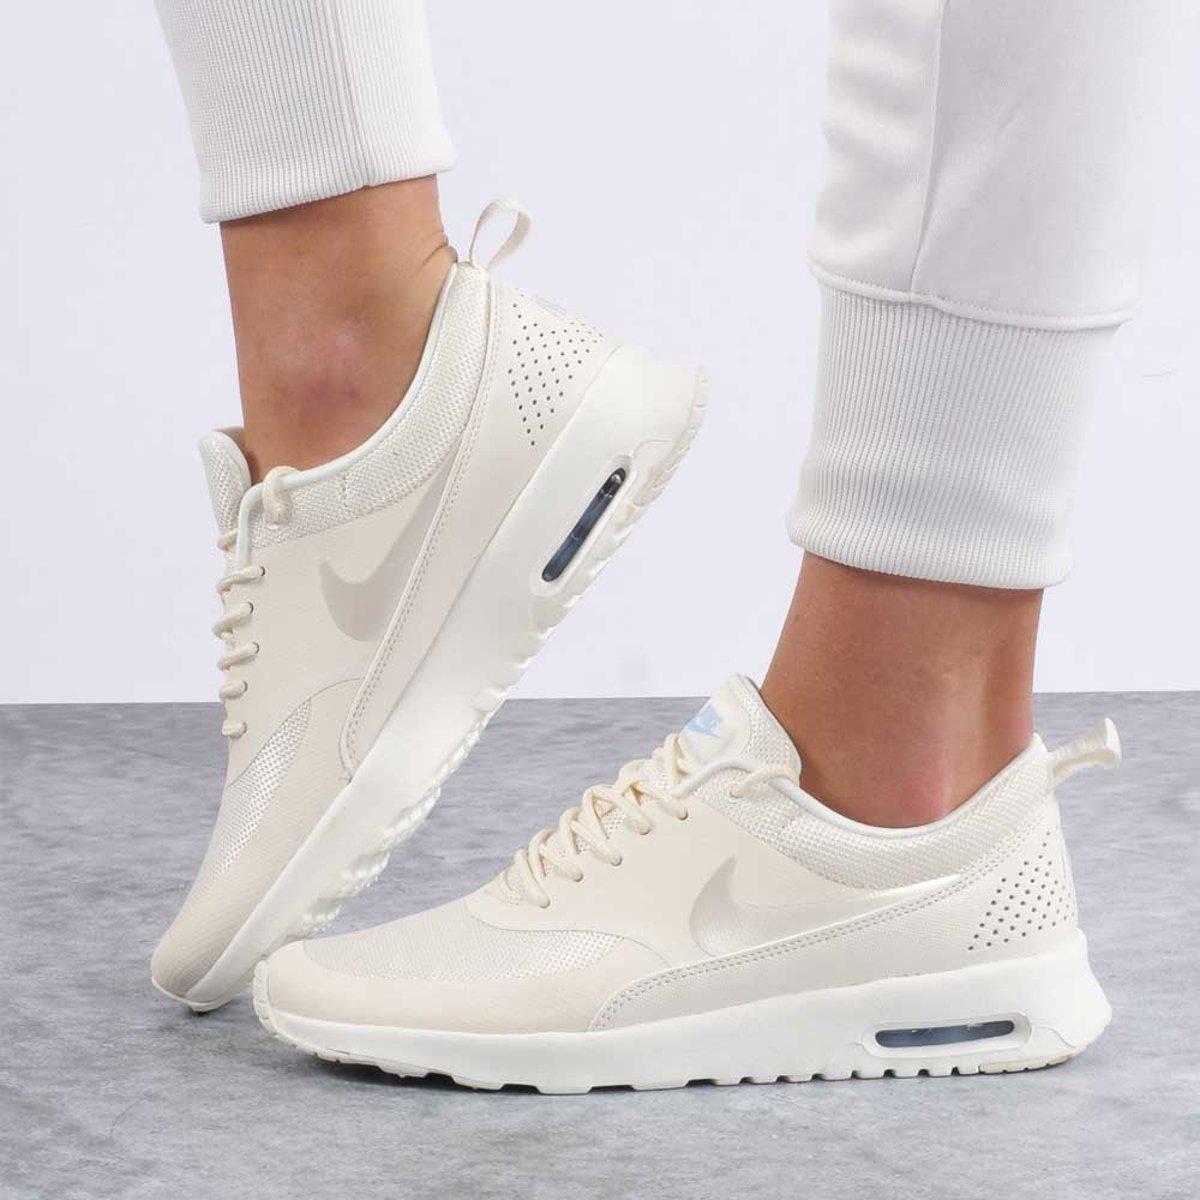   Nike Air Max Thea sneakers dames creme